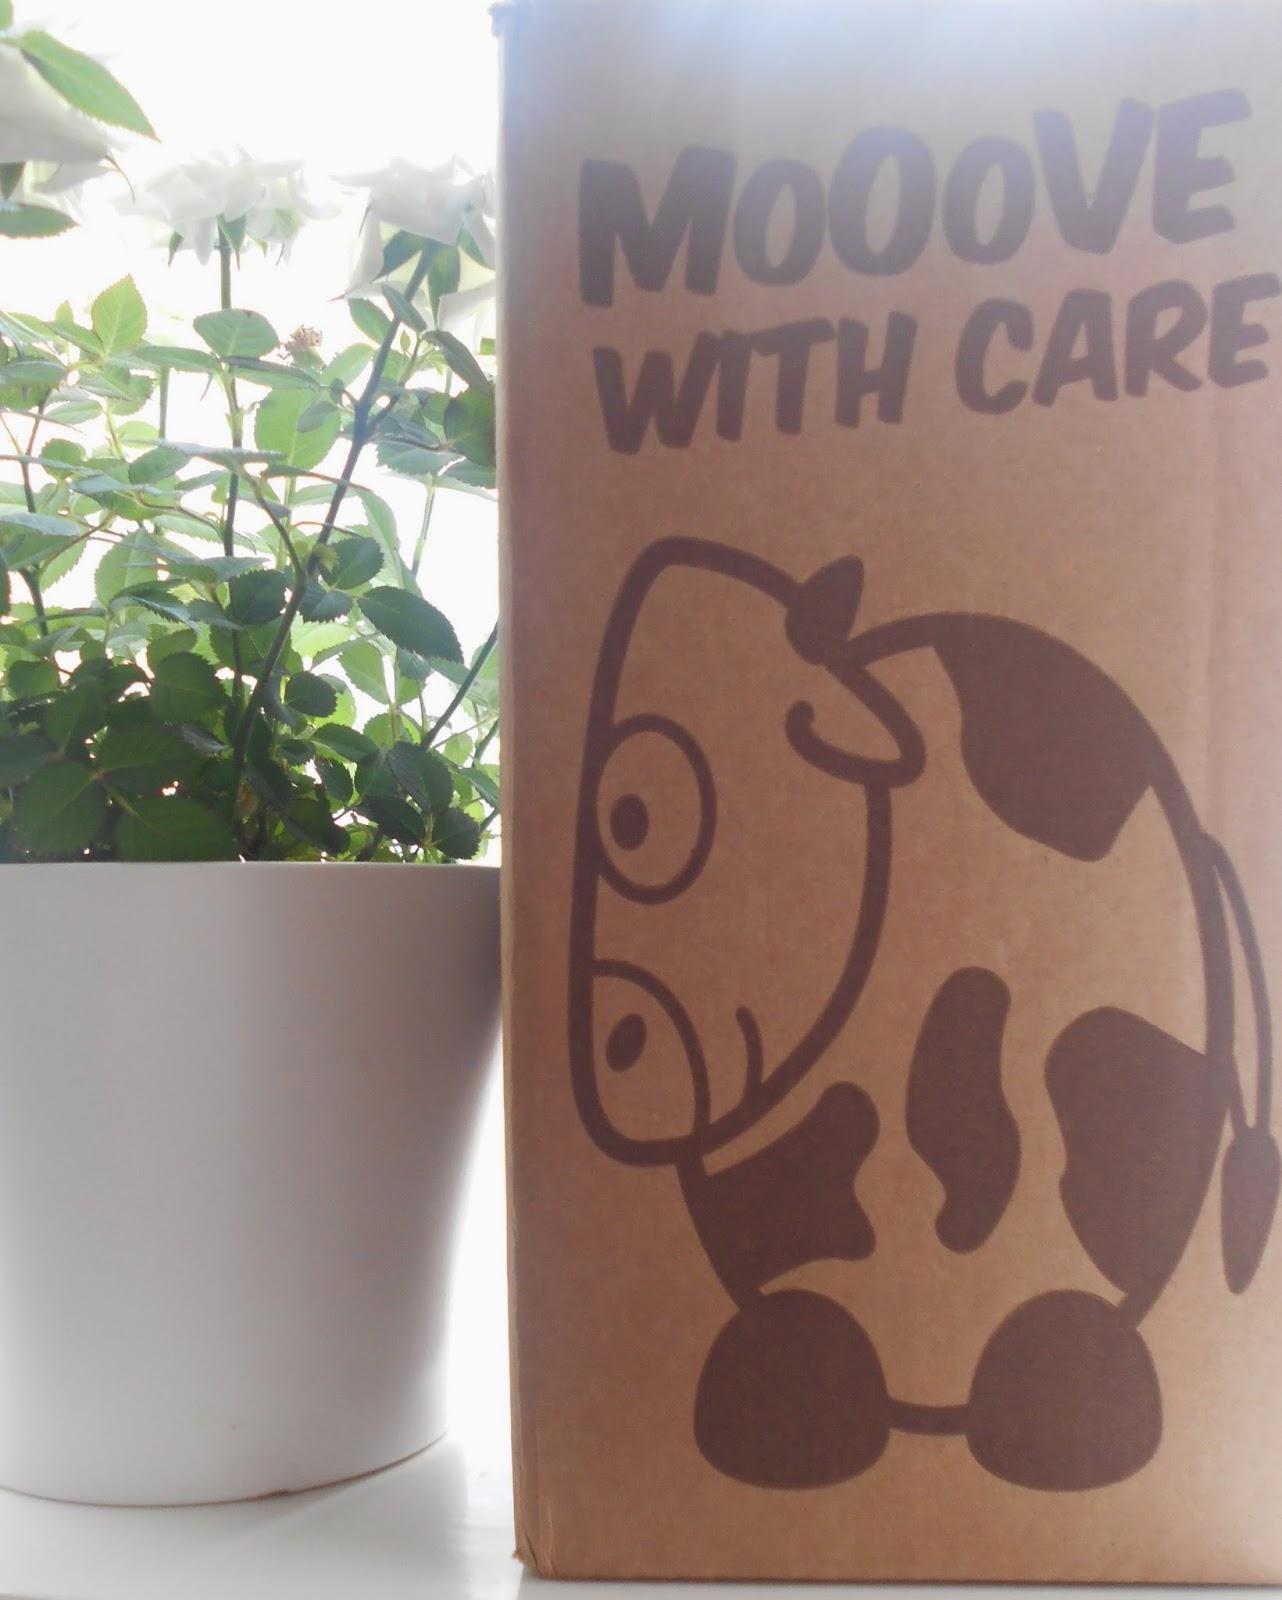 MooGoo Natural Skincare